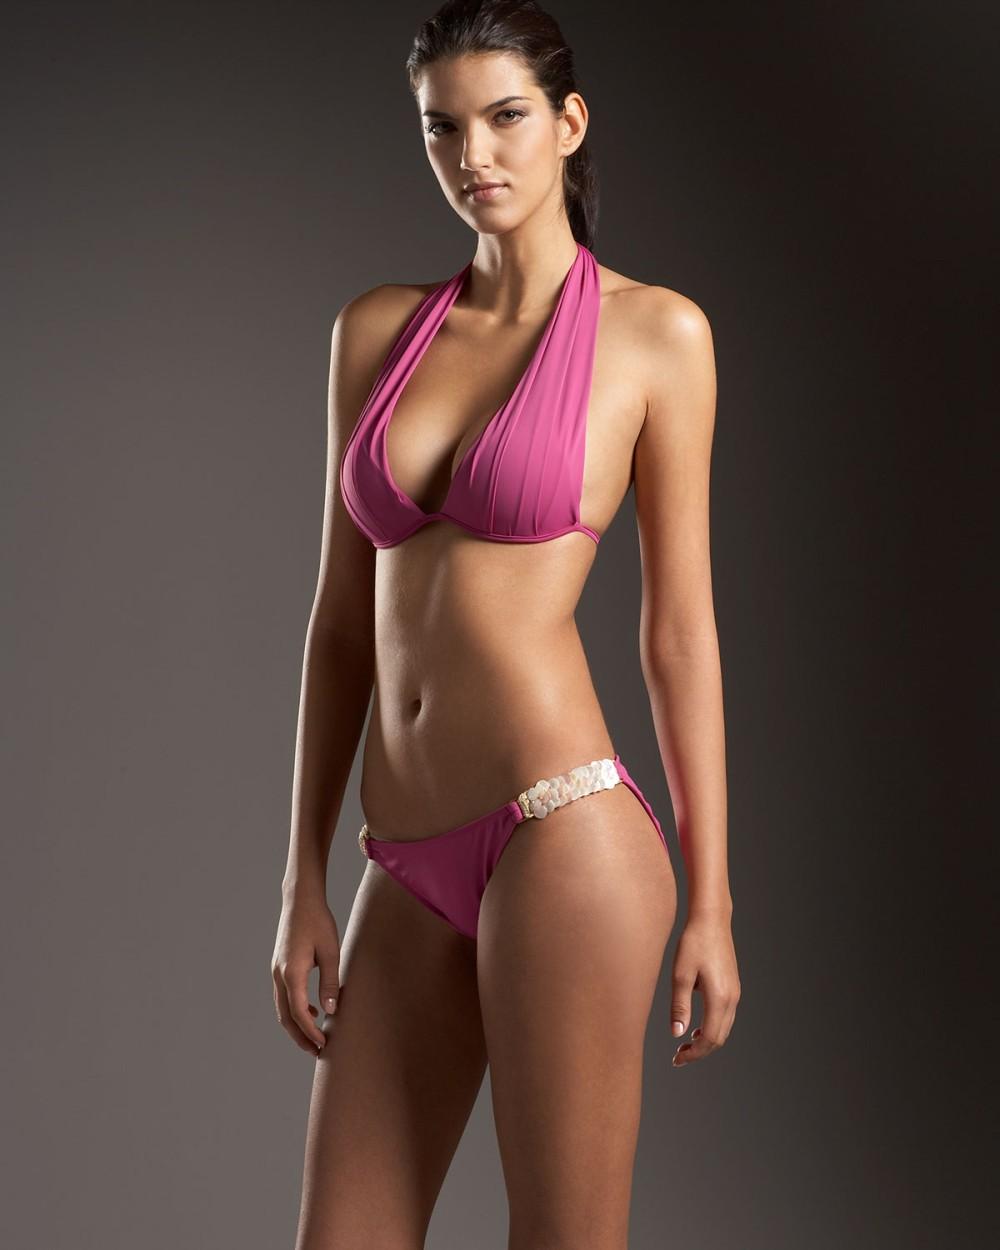 Tina Yuzuki nudes (86 photo), Tits, Leaked, Instagram, braless 2006